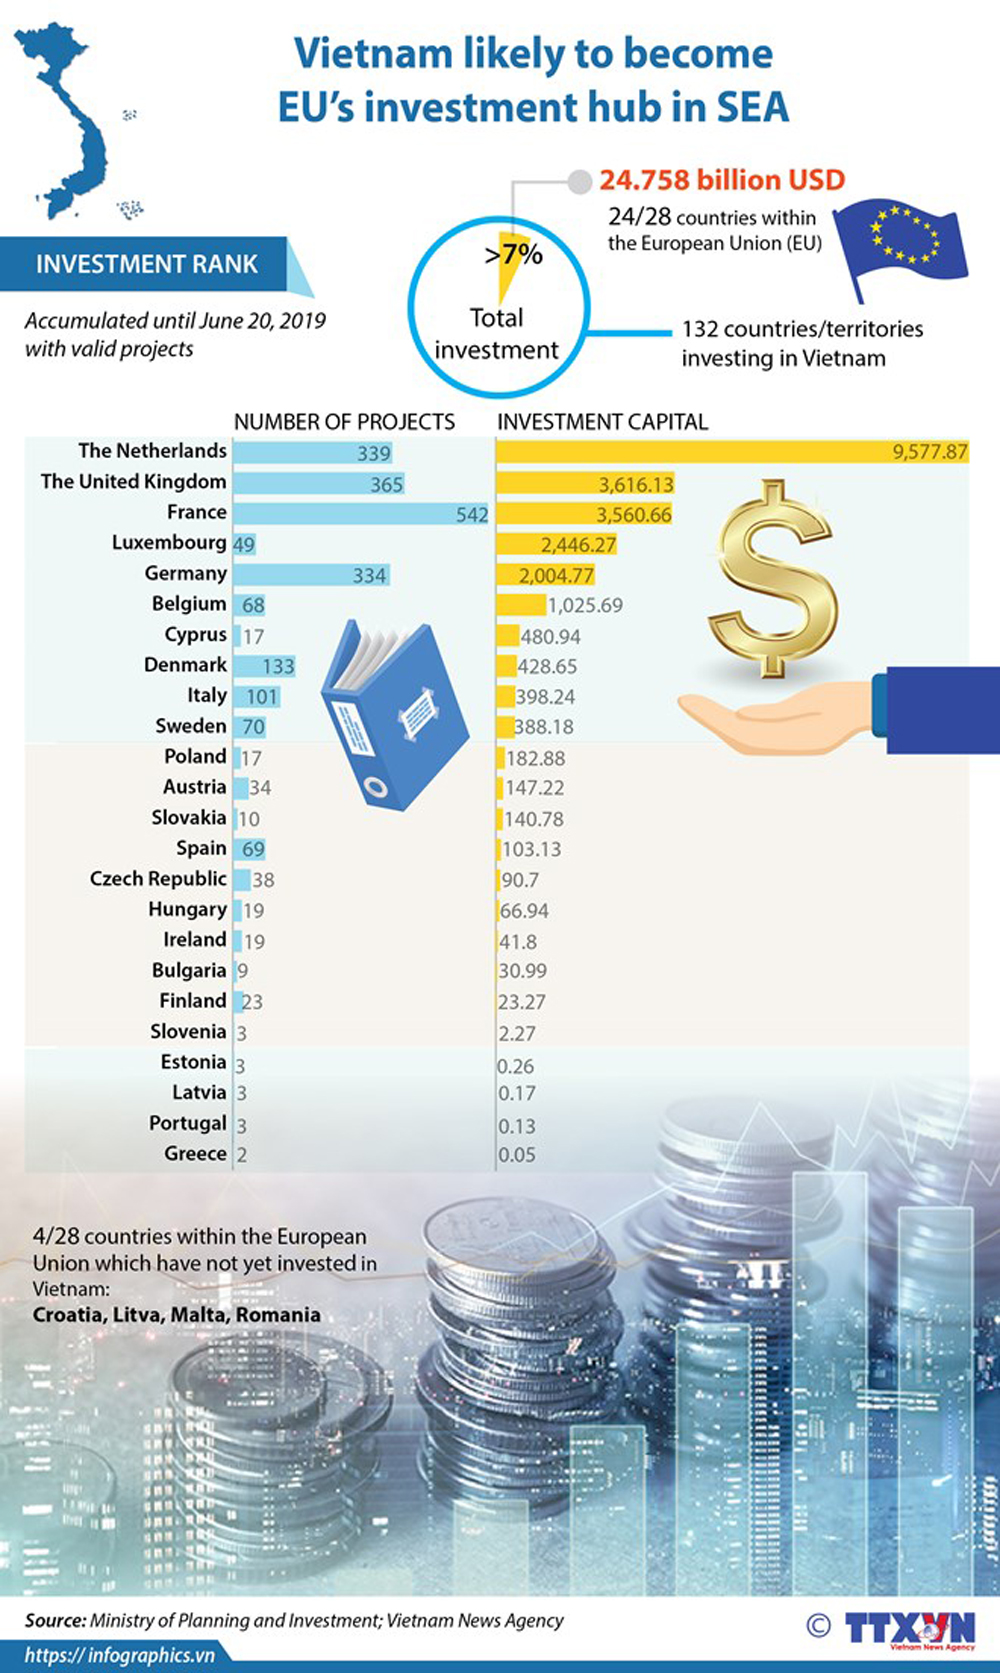 Vietnam, EU, investment hub, SEA, economic hub, investment attraction